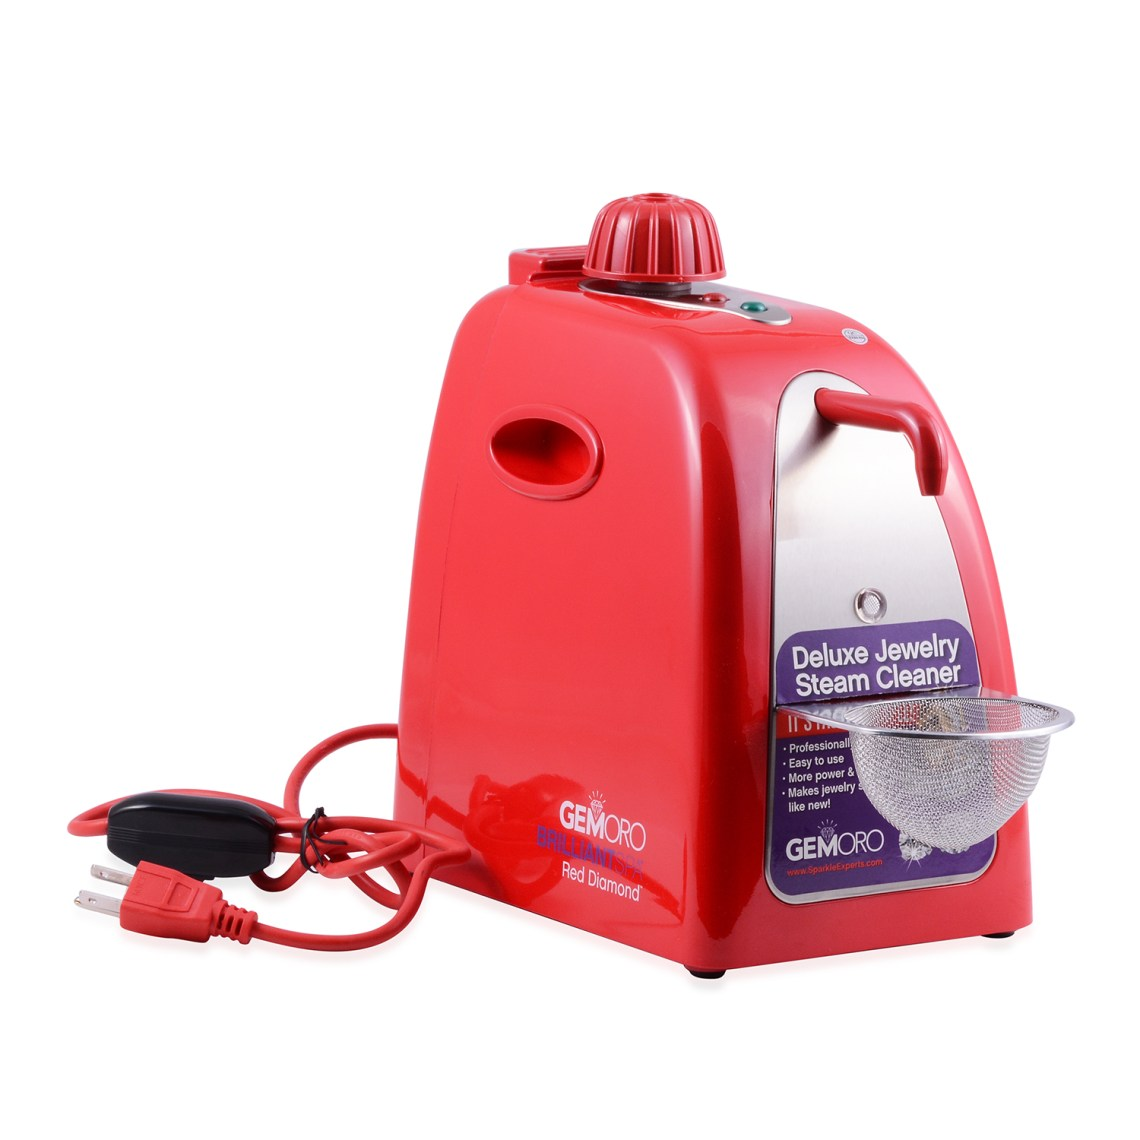 Red GEMORO steam cleaner.